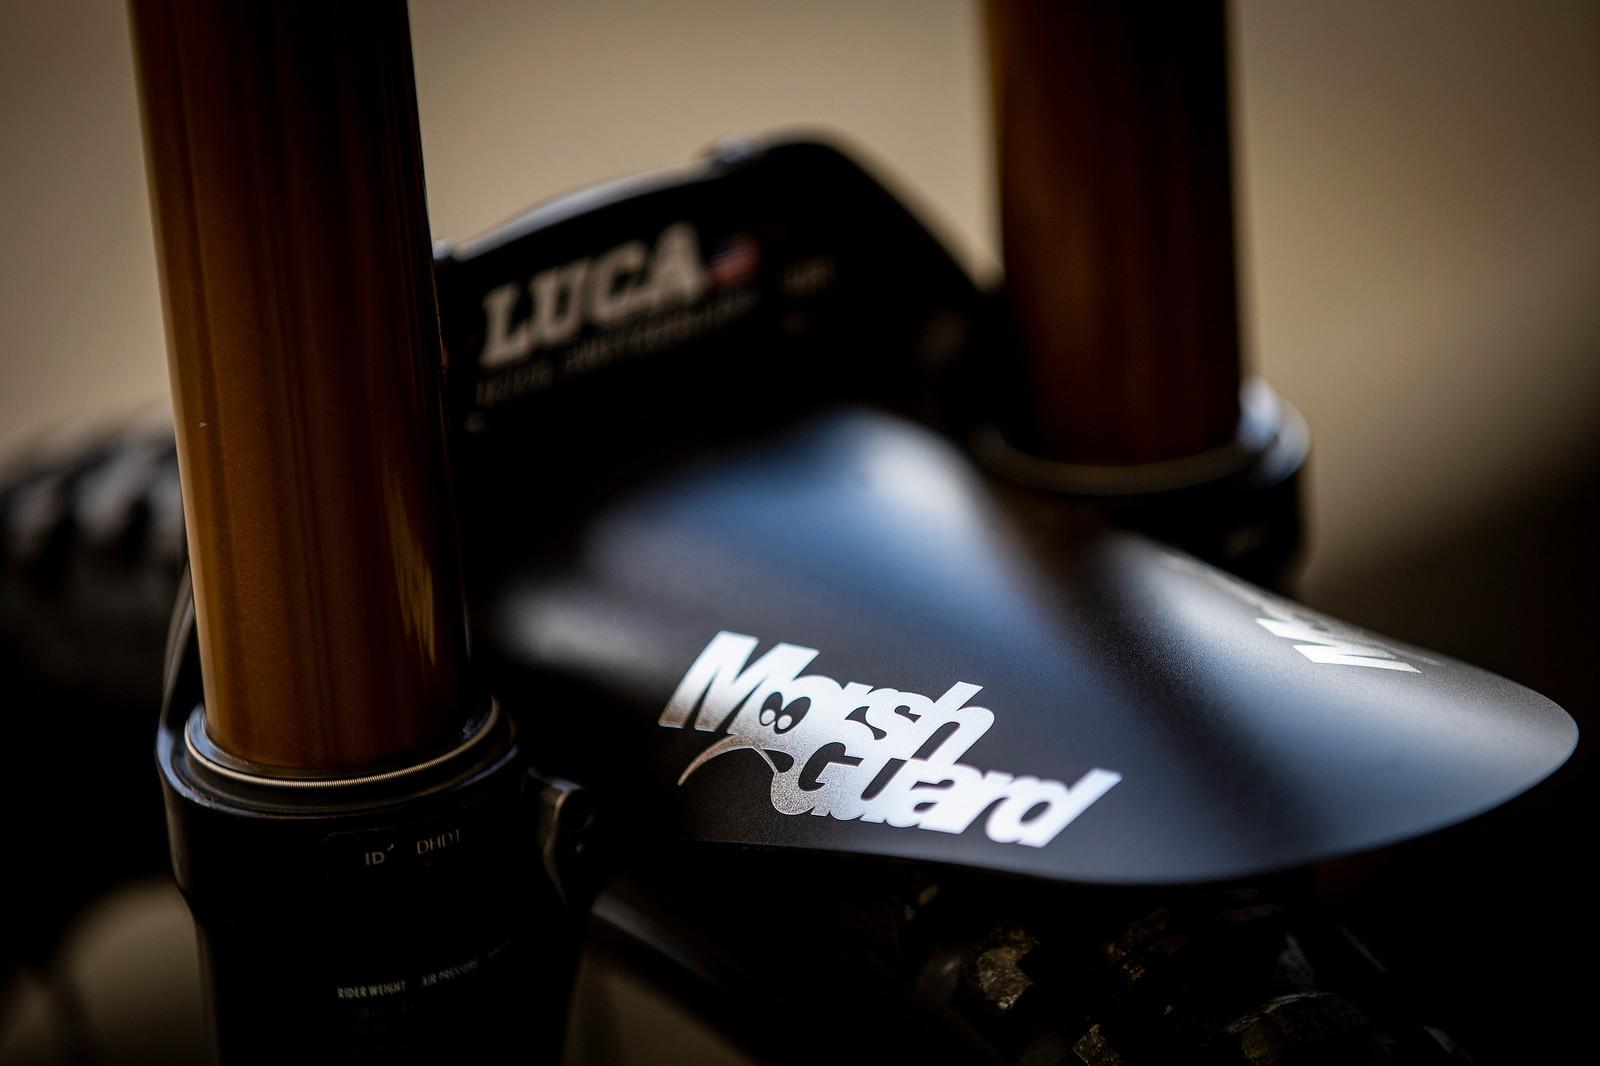 Marsh Guard - WORLD CHAMPS BIKE - Luca Shaw's Santa Cruz V10 - Mountain Biking Pictures - Vital MTB